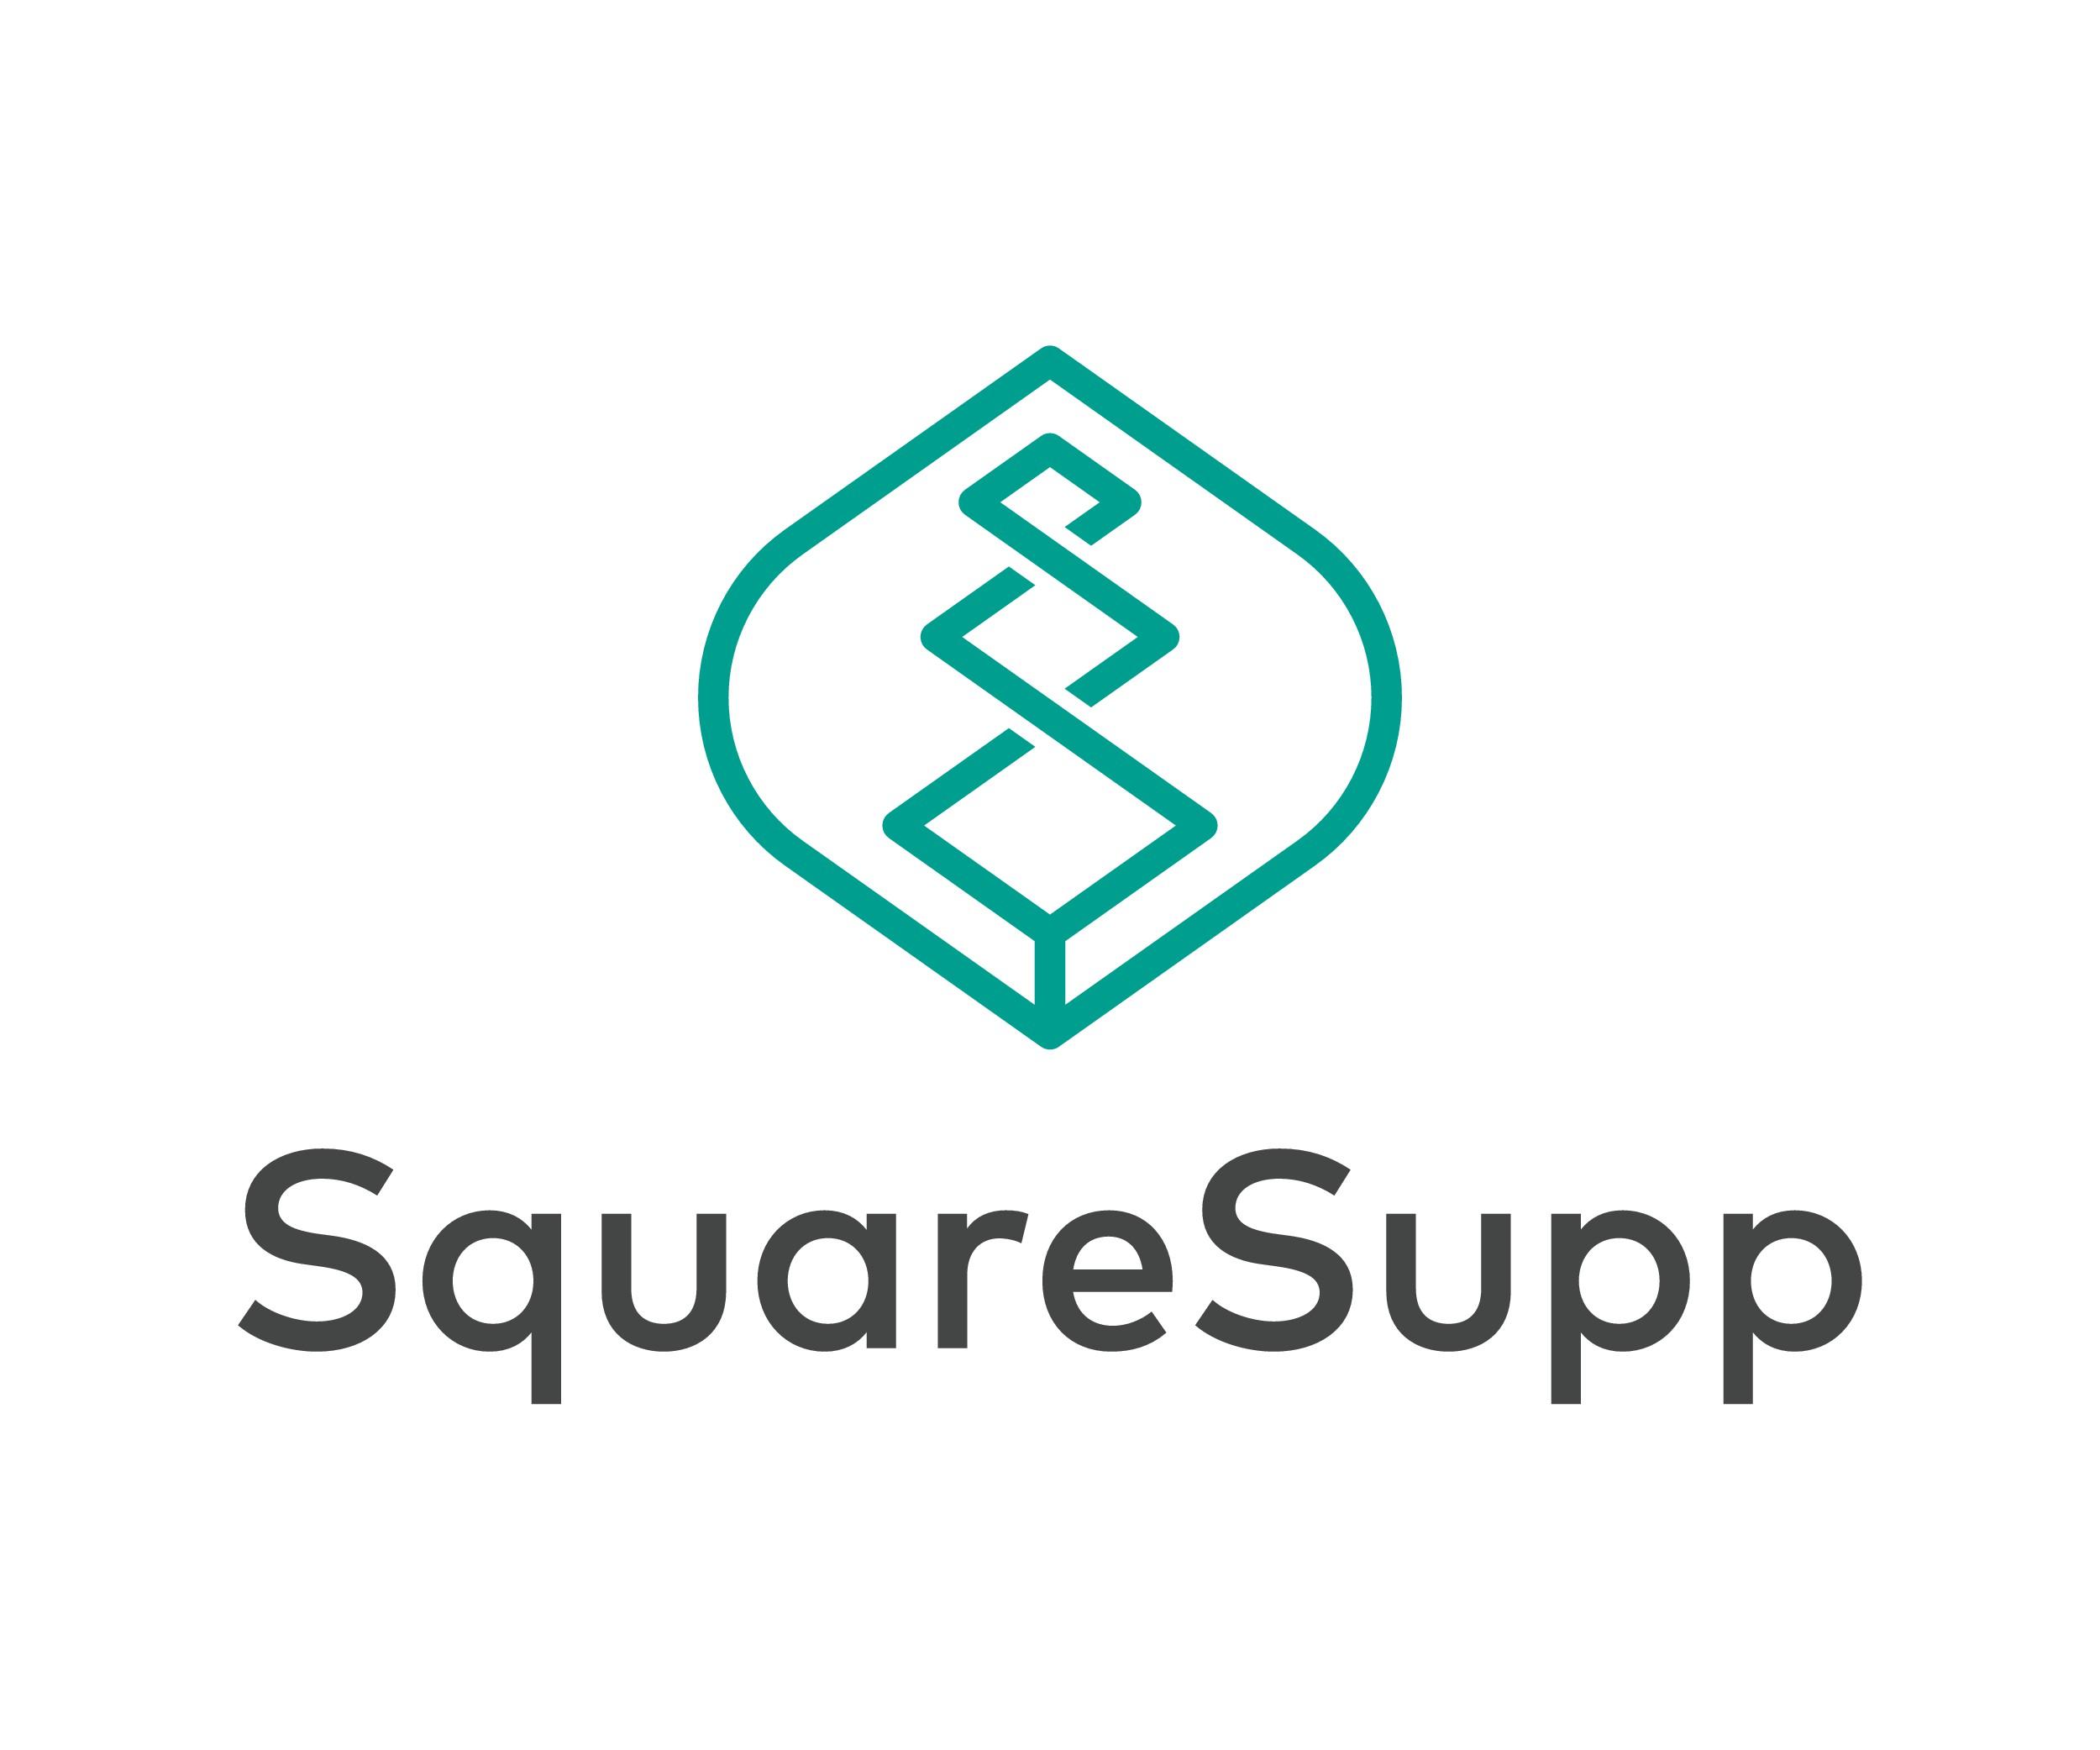 Design a distinctive logo for SquareSupp (the next generation of supplementation)